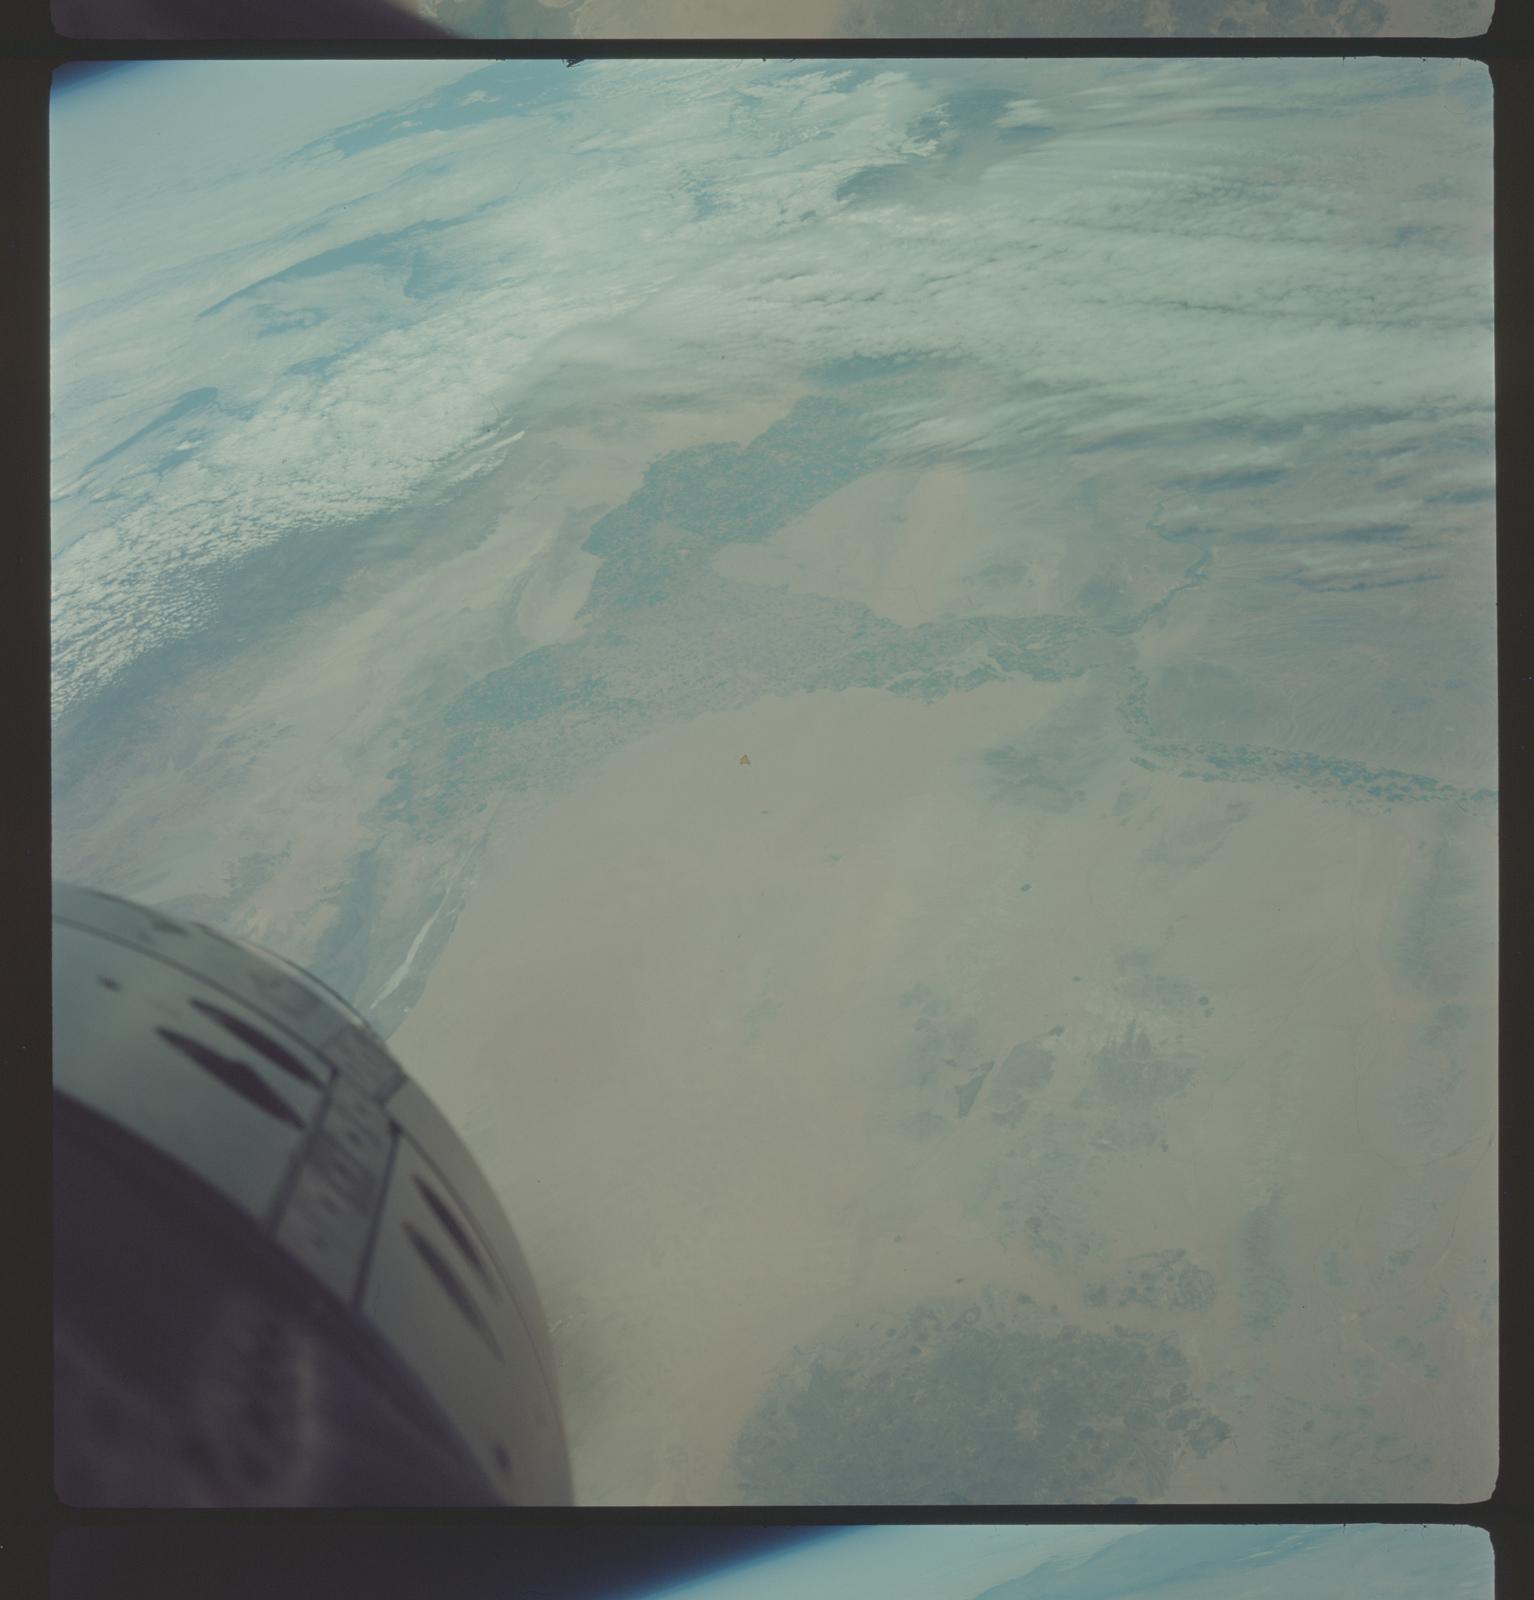 Gemini III Mission Image - Mexico, California and Arizona